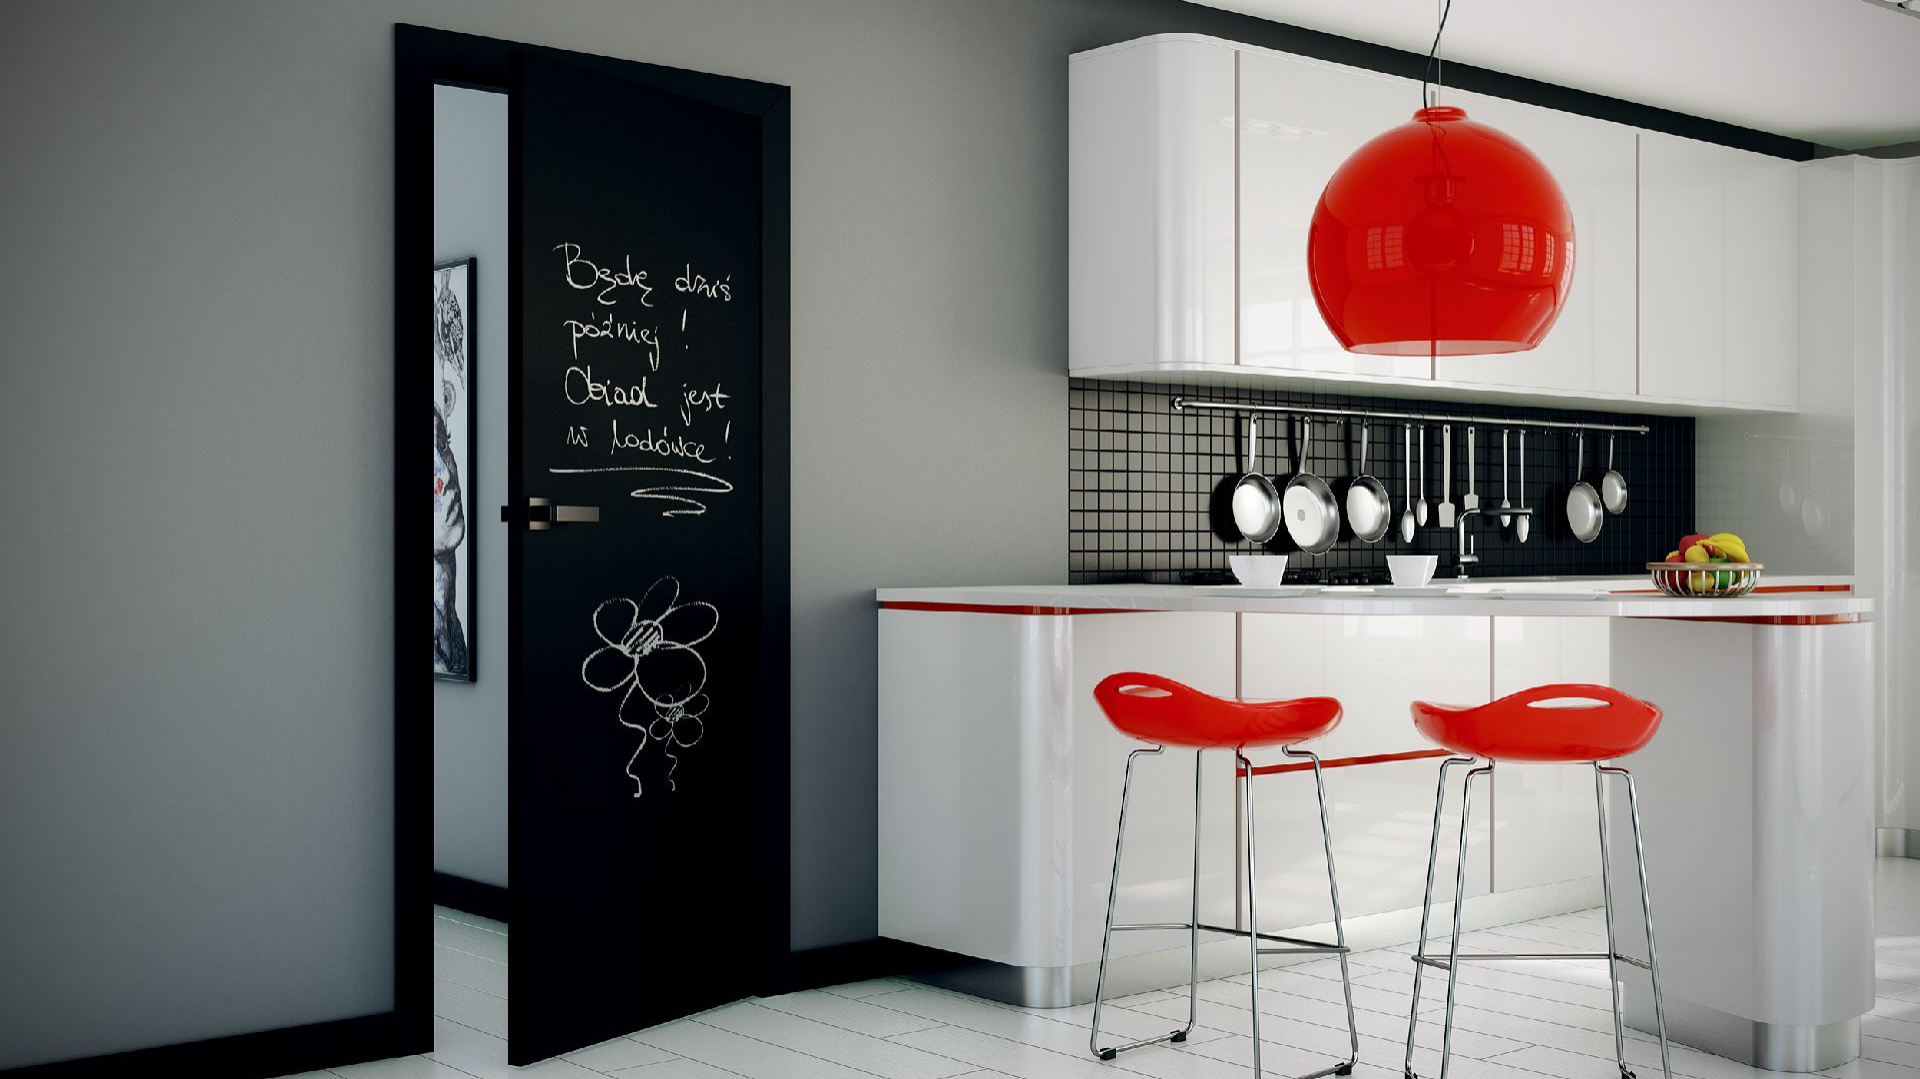 Drzwi Blackboard Interdoor, po których można pisać kredą. Fot. Interdoor.